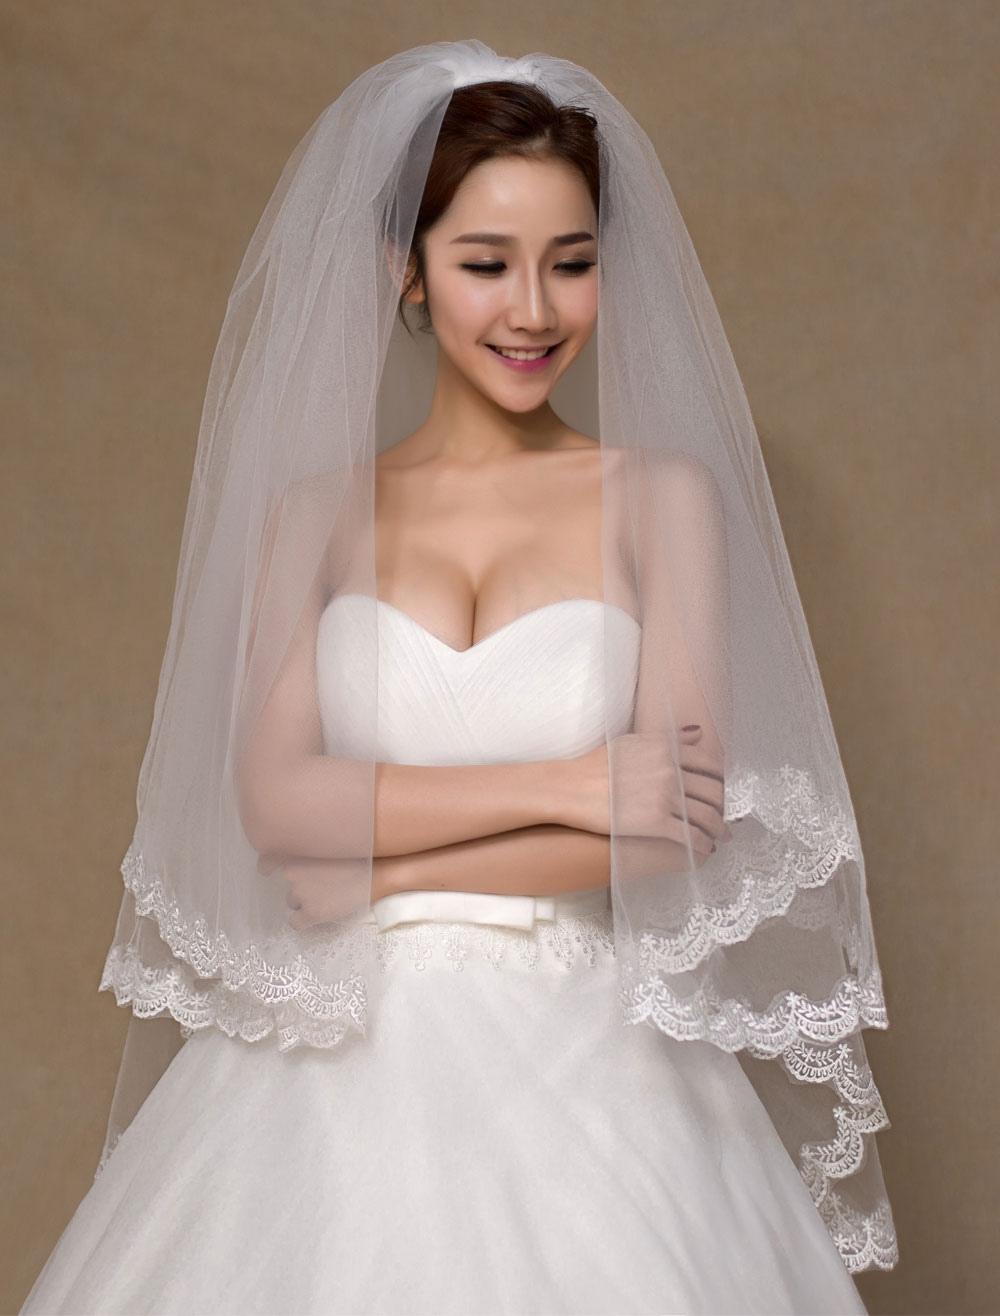 Ivory Semi-Sheer Tulle Chic Bridal Wedding Veil